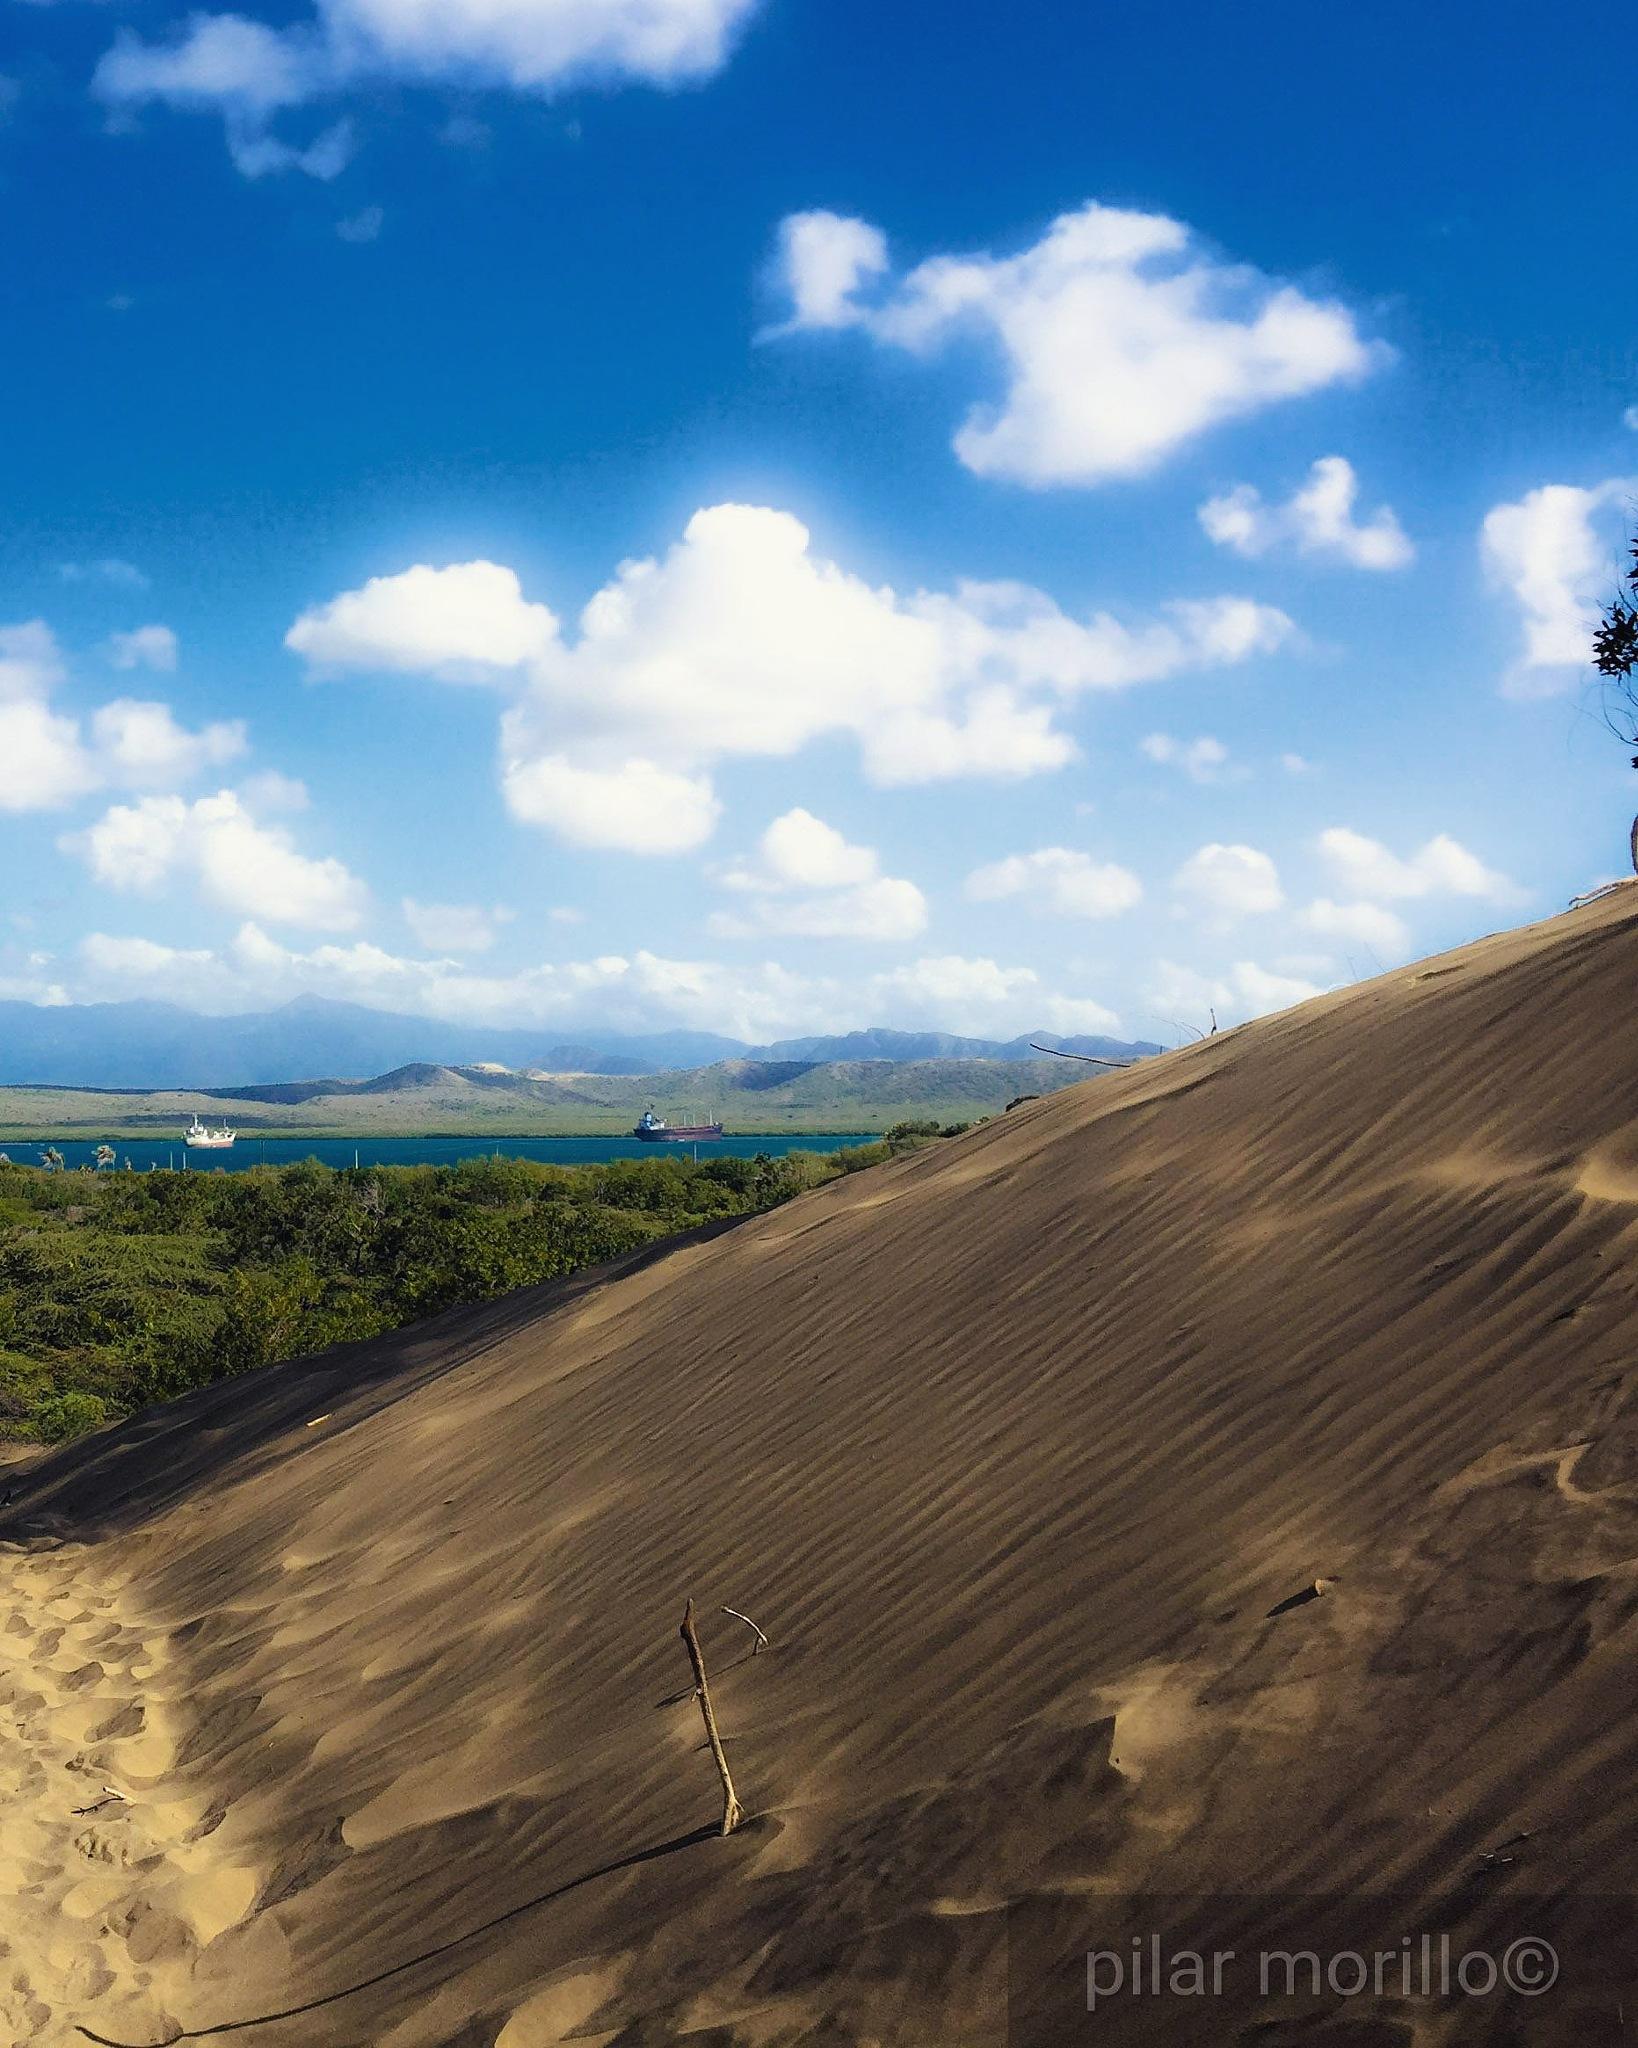 dunes by Pilar Morillo